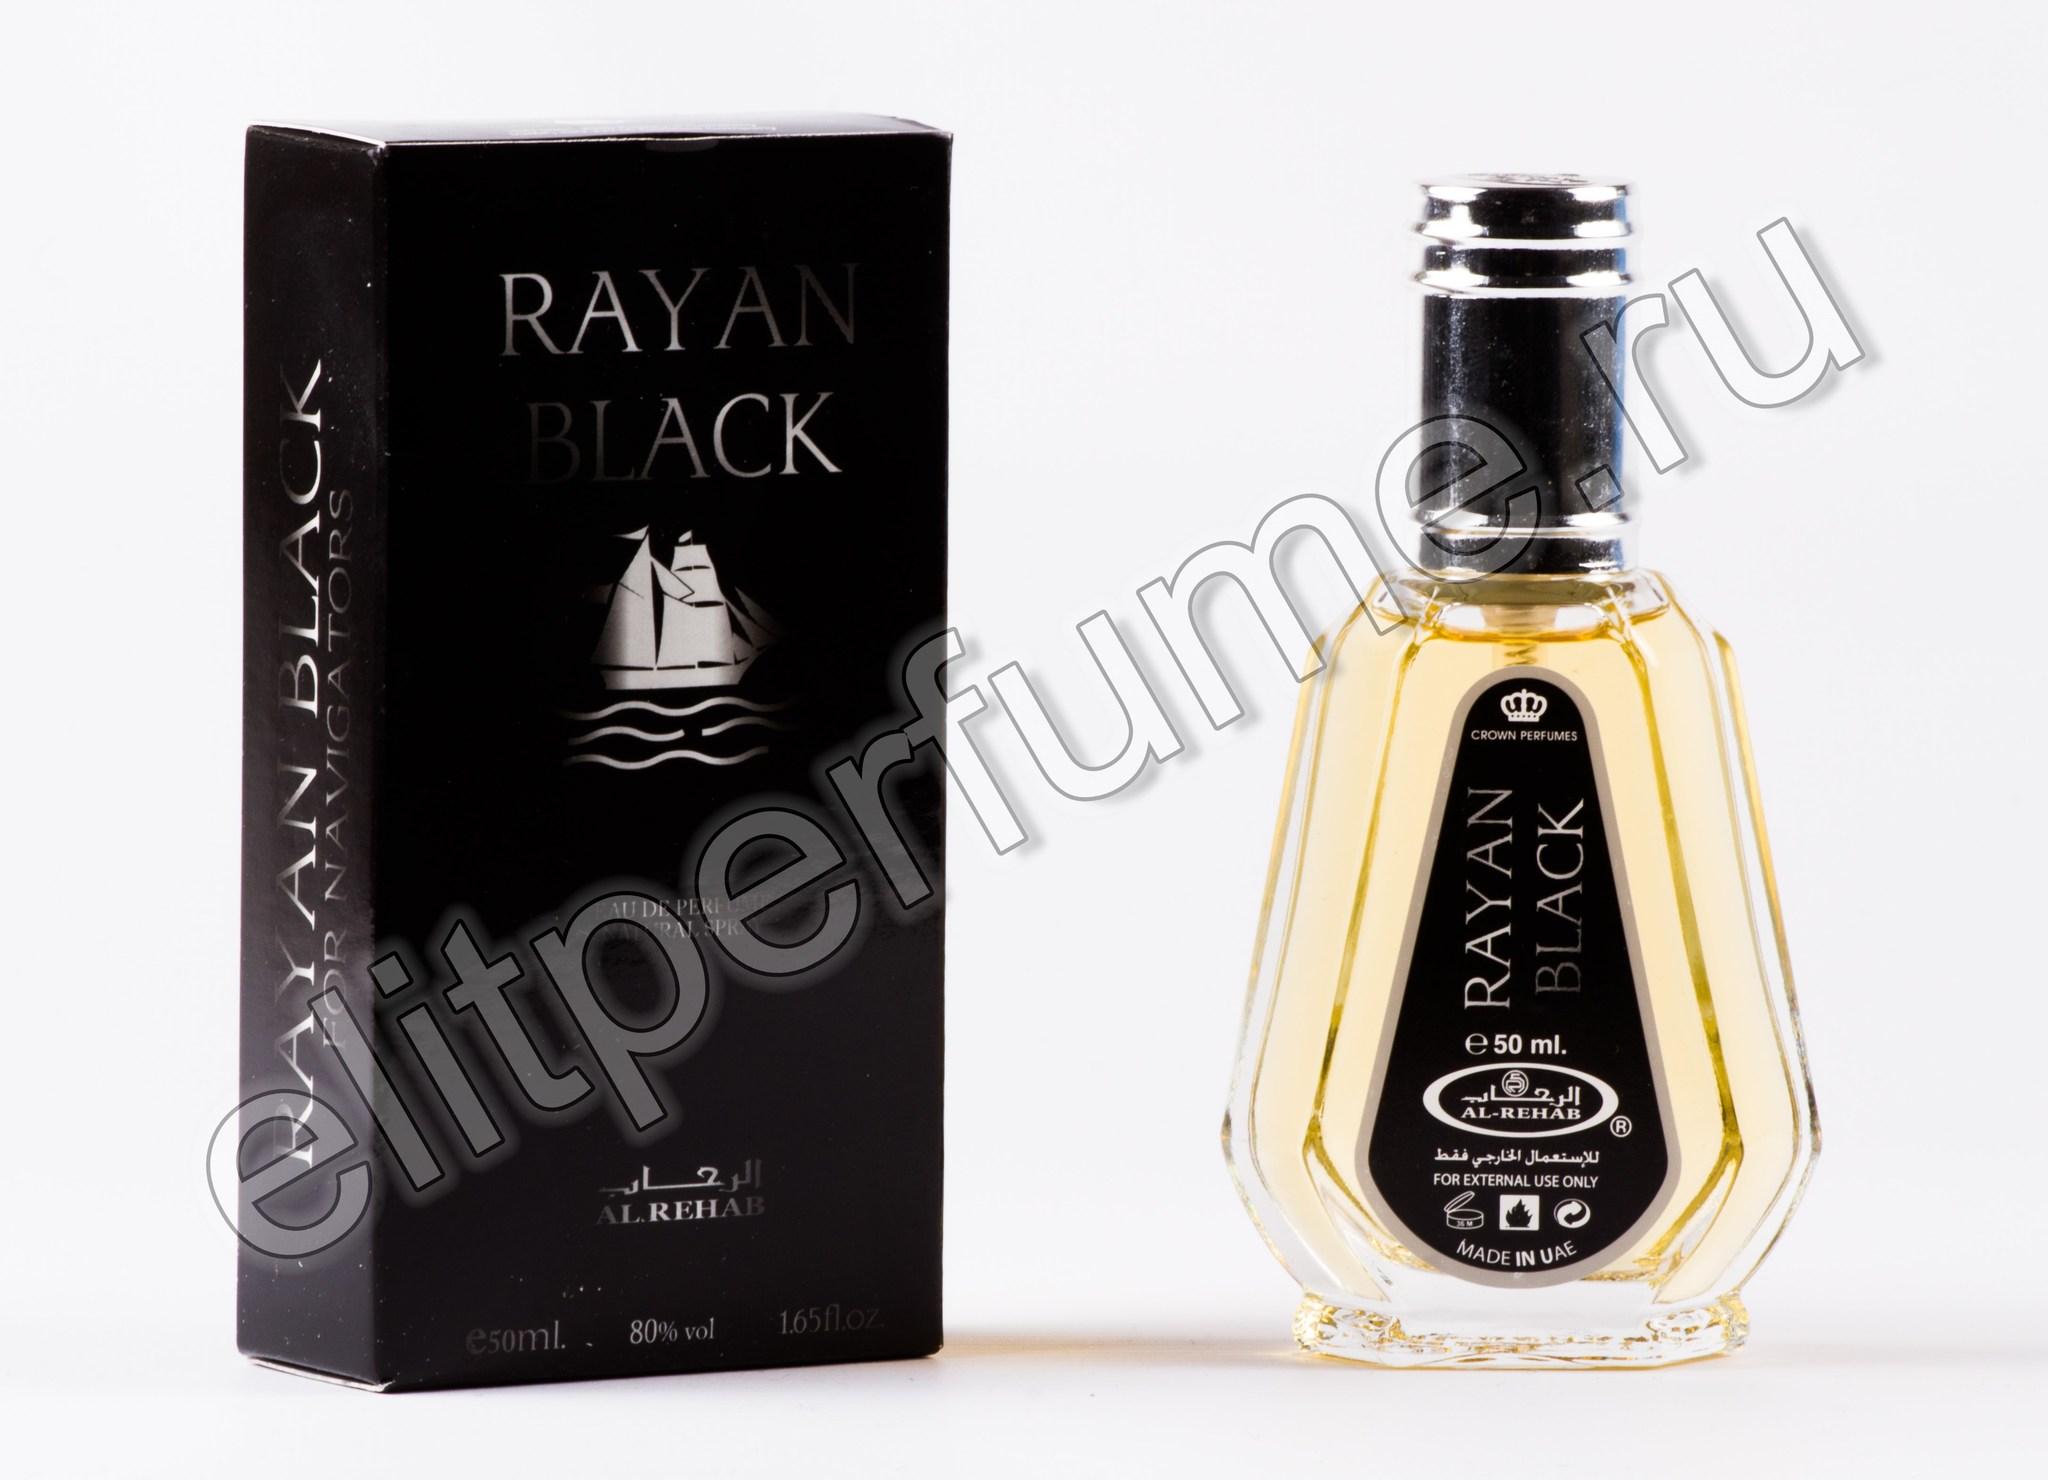 Rayan Black Райан Блэк 50 мл спрей от Аль Рехаб Al Rehab